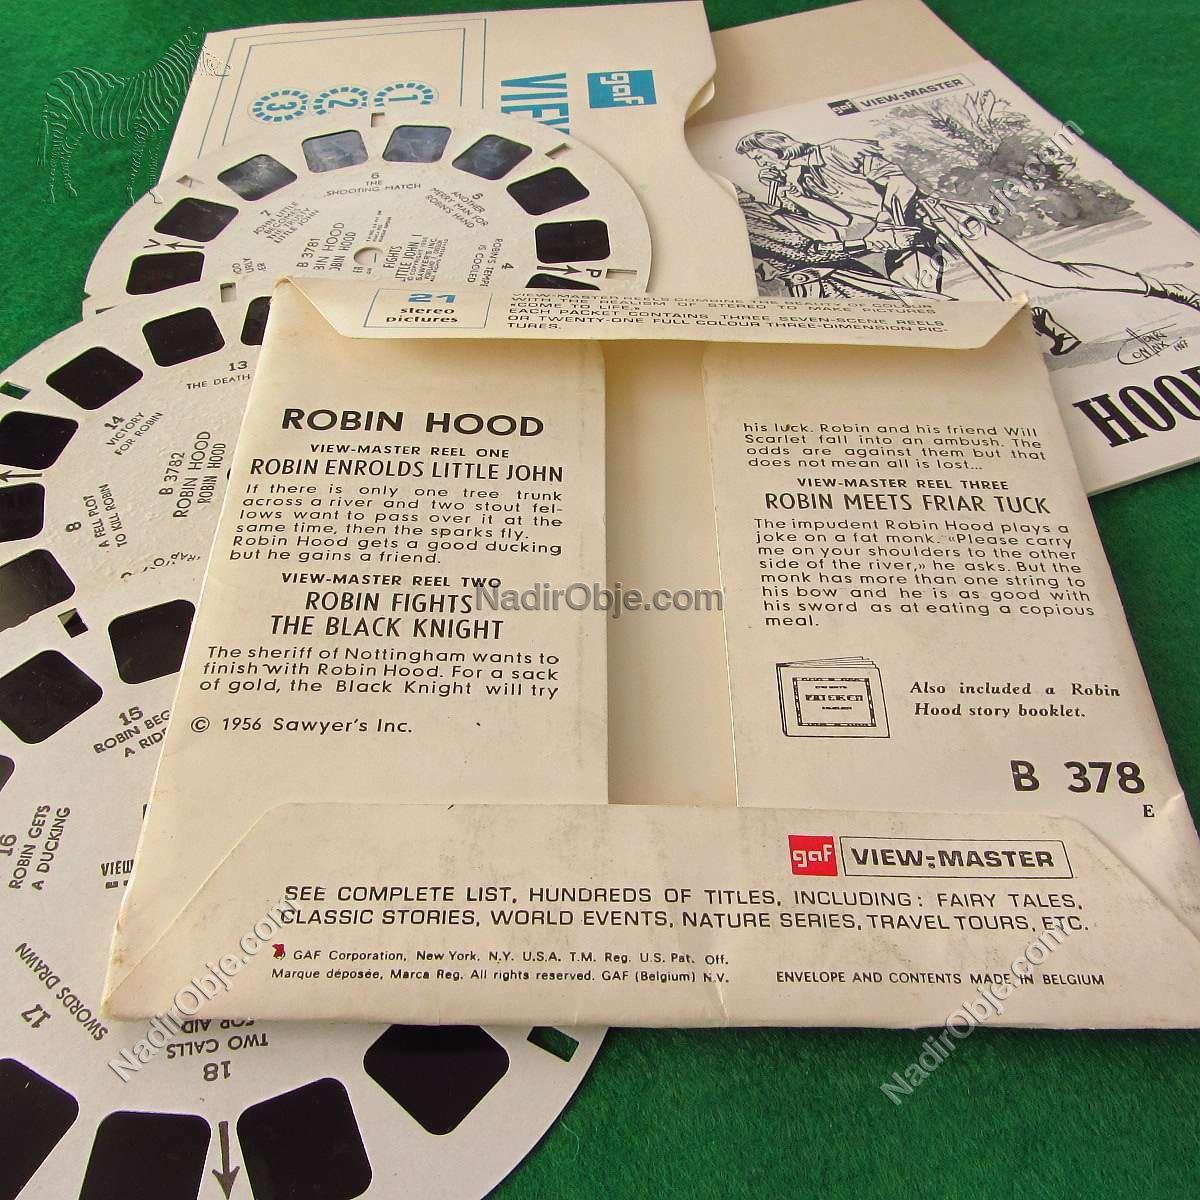 Robin Hood View-Master Film Diğer Objeler 3Boyutlu